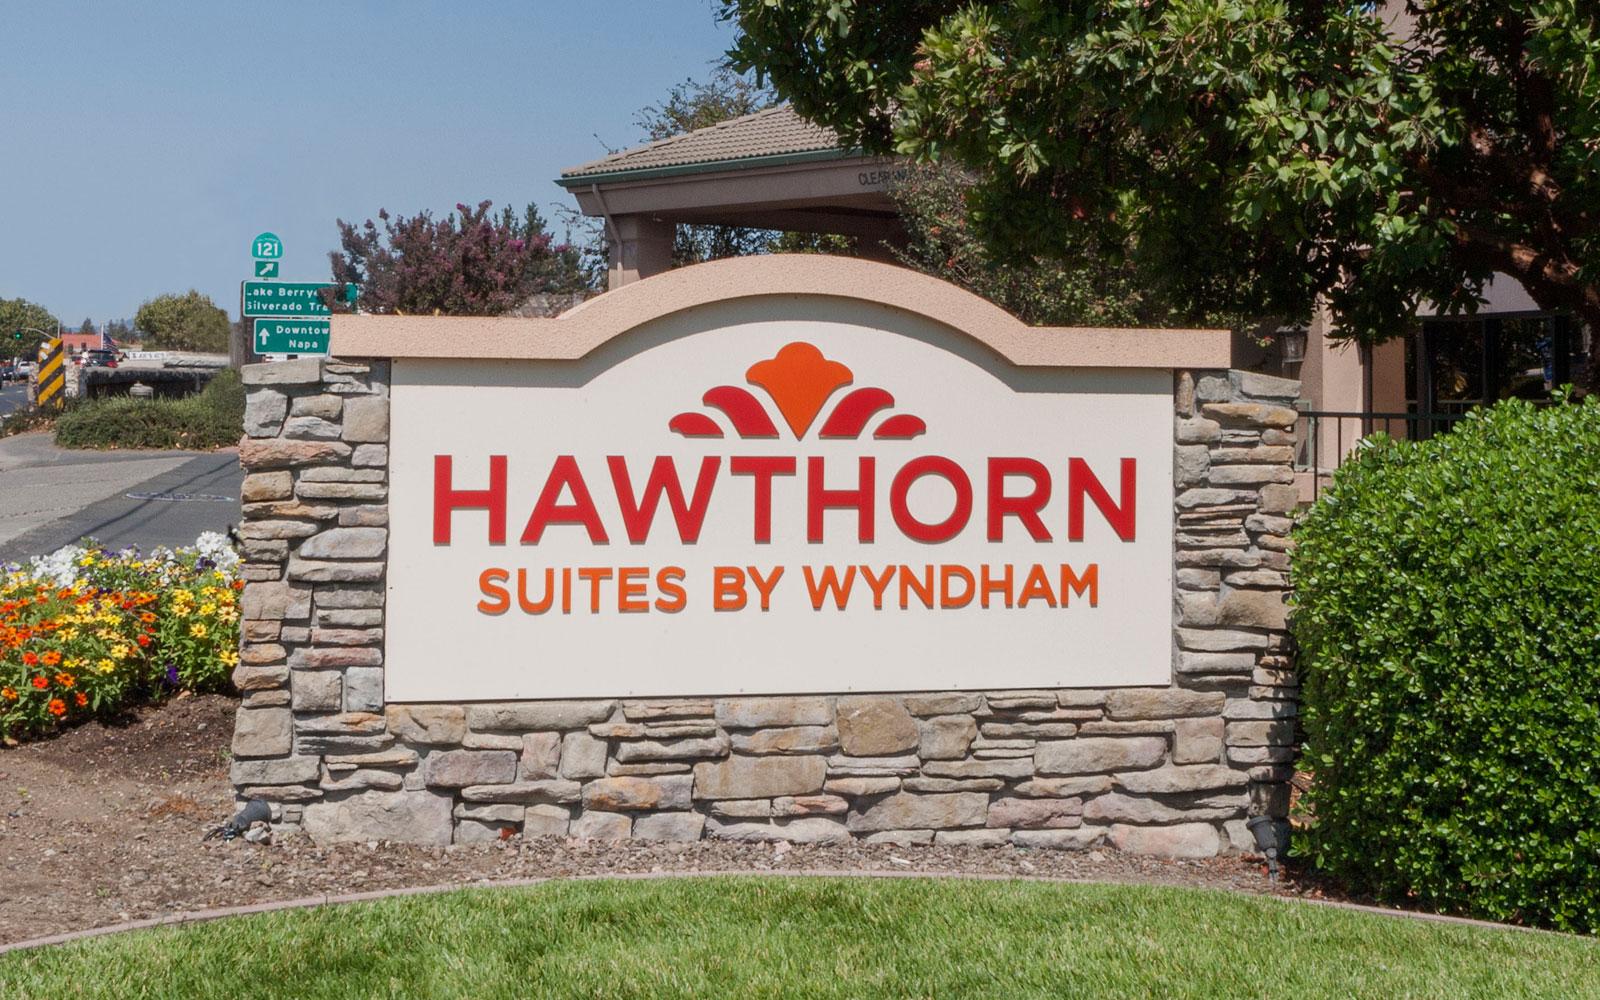 Napa Ca Hotel Hawthorn Suites By Wyndham Napa Valley